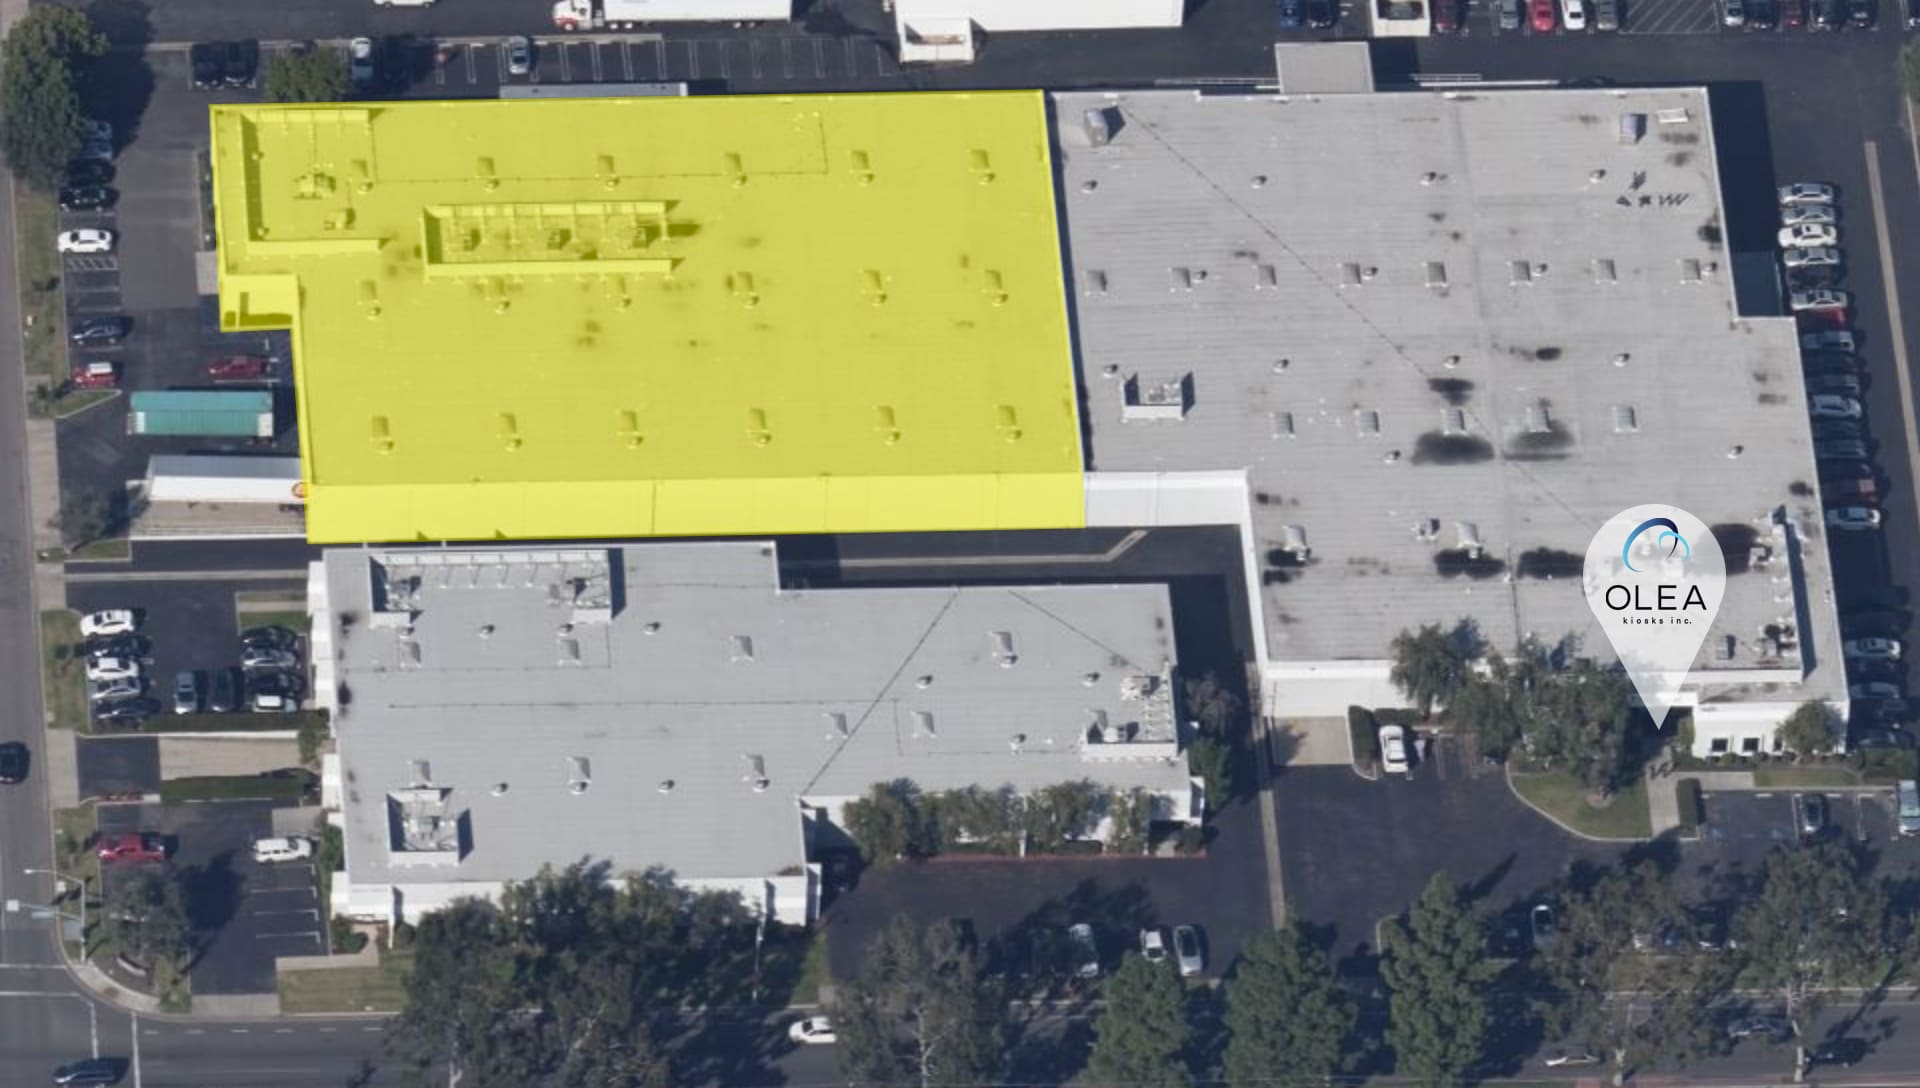 Olea Building Expansion